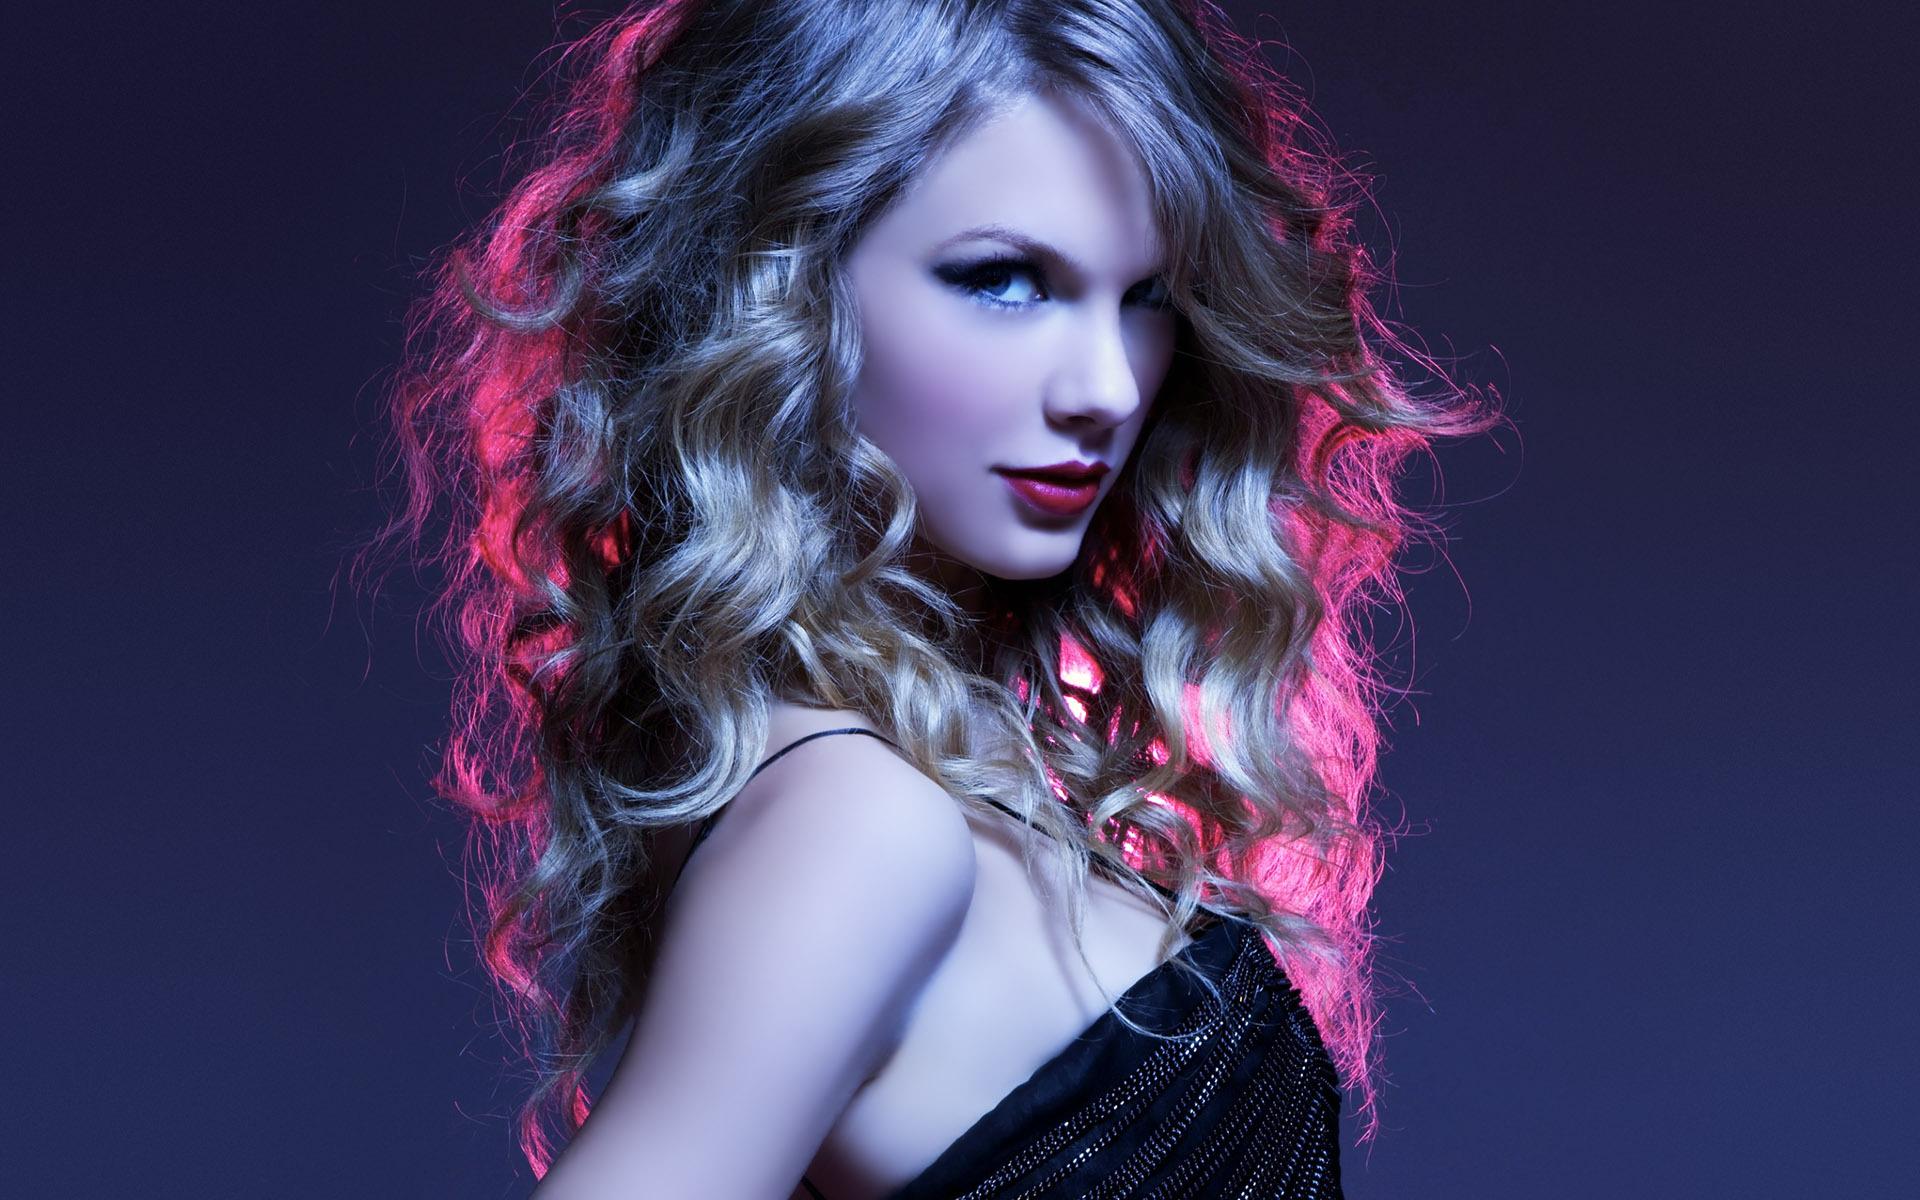 Music_Taylor_Swift_purple_lights_045822_